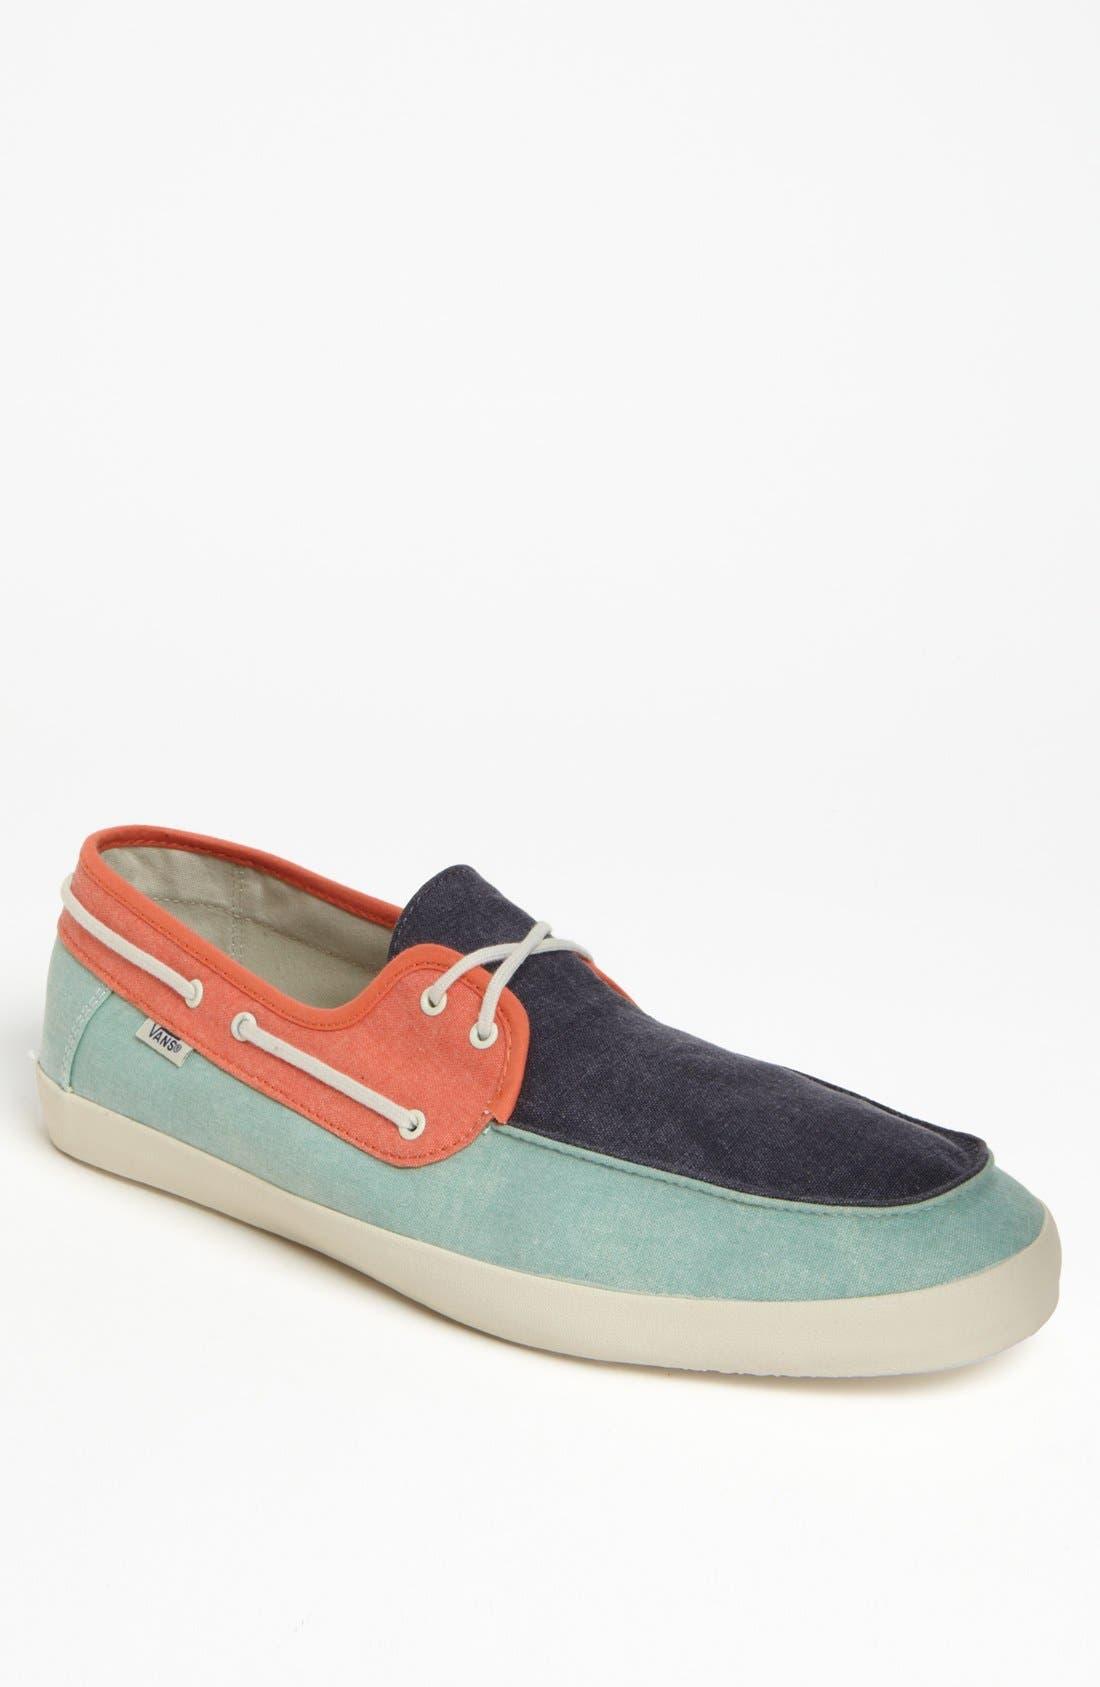 vans boat shoes mens